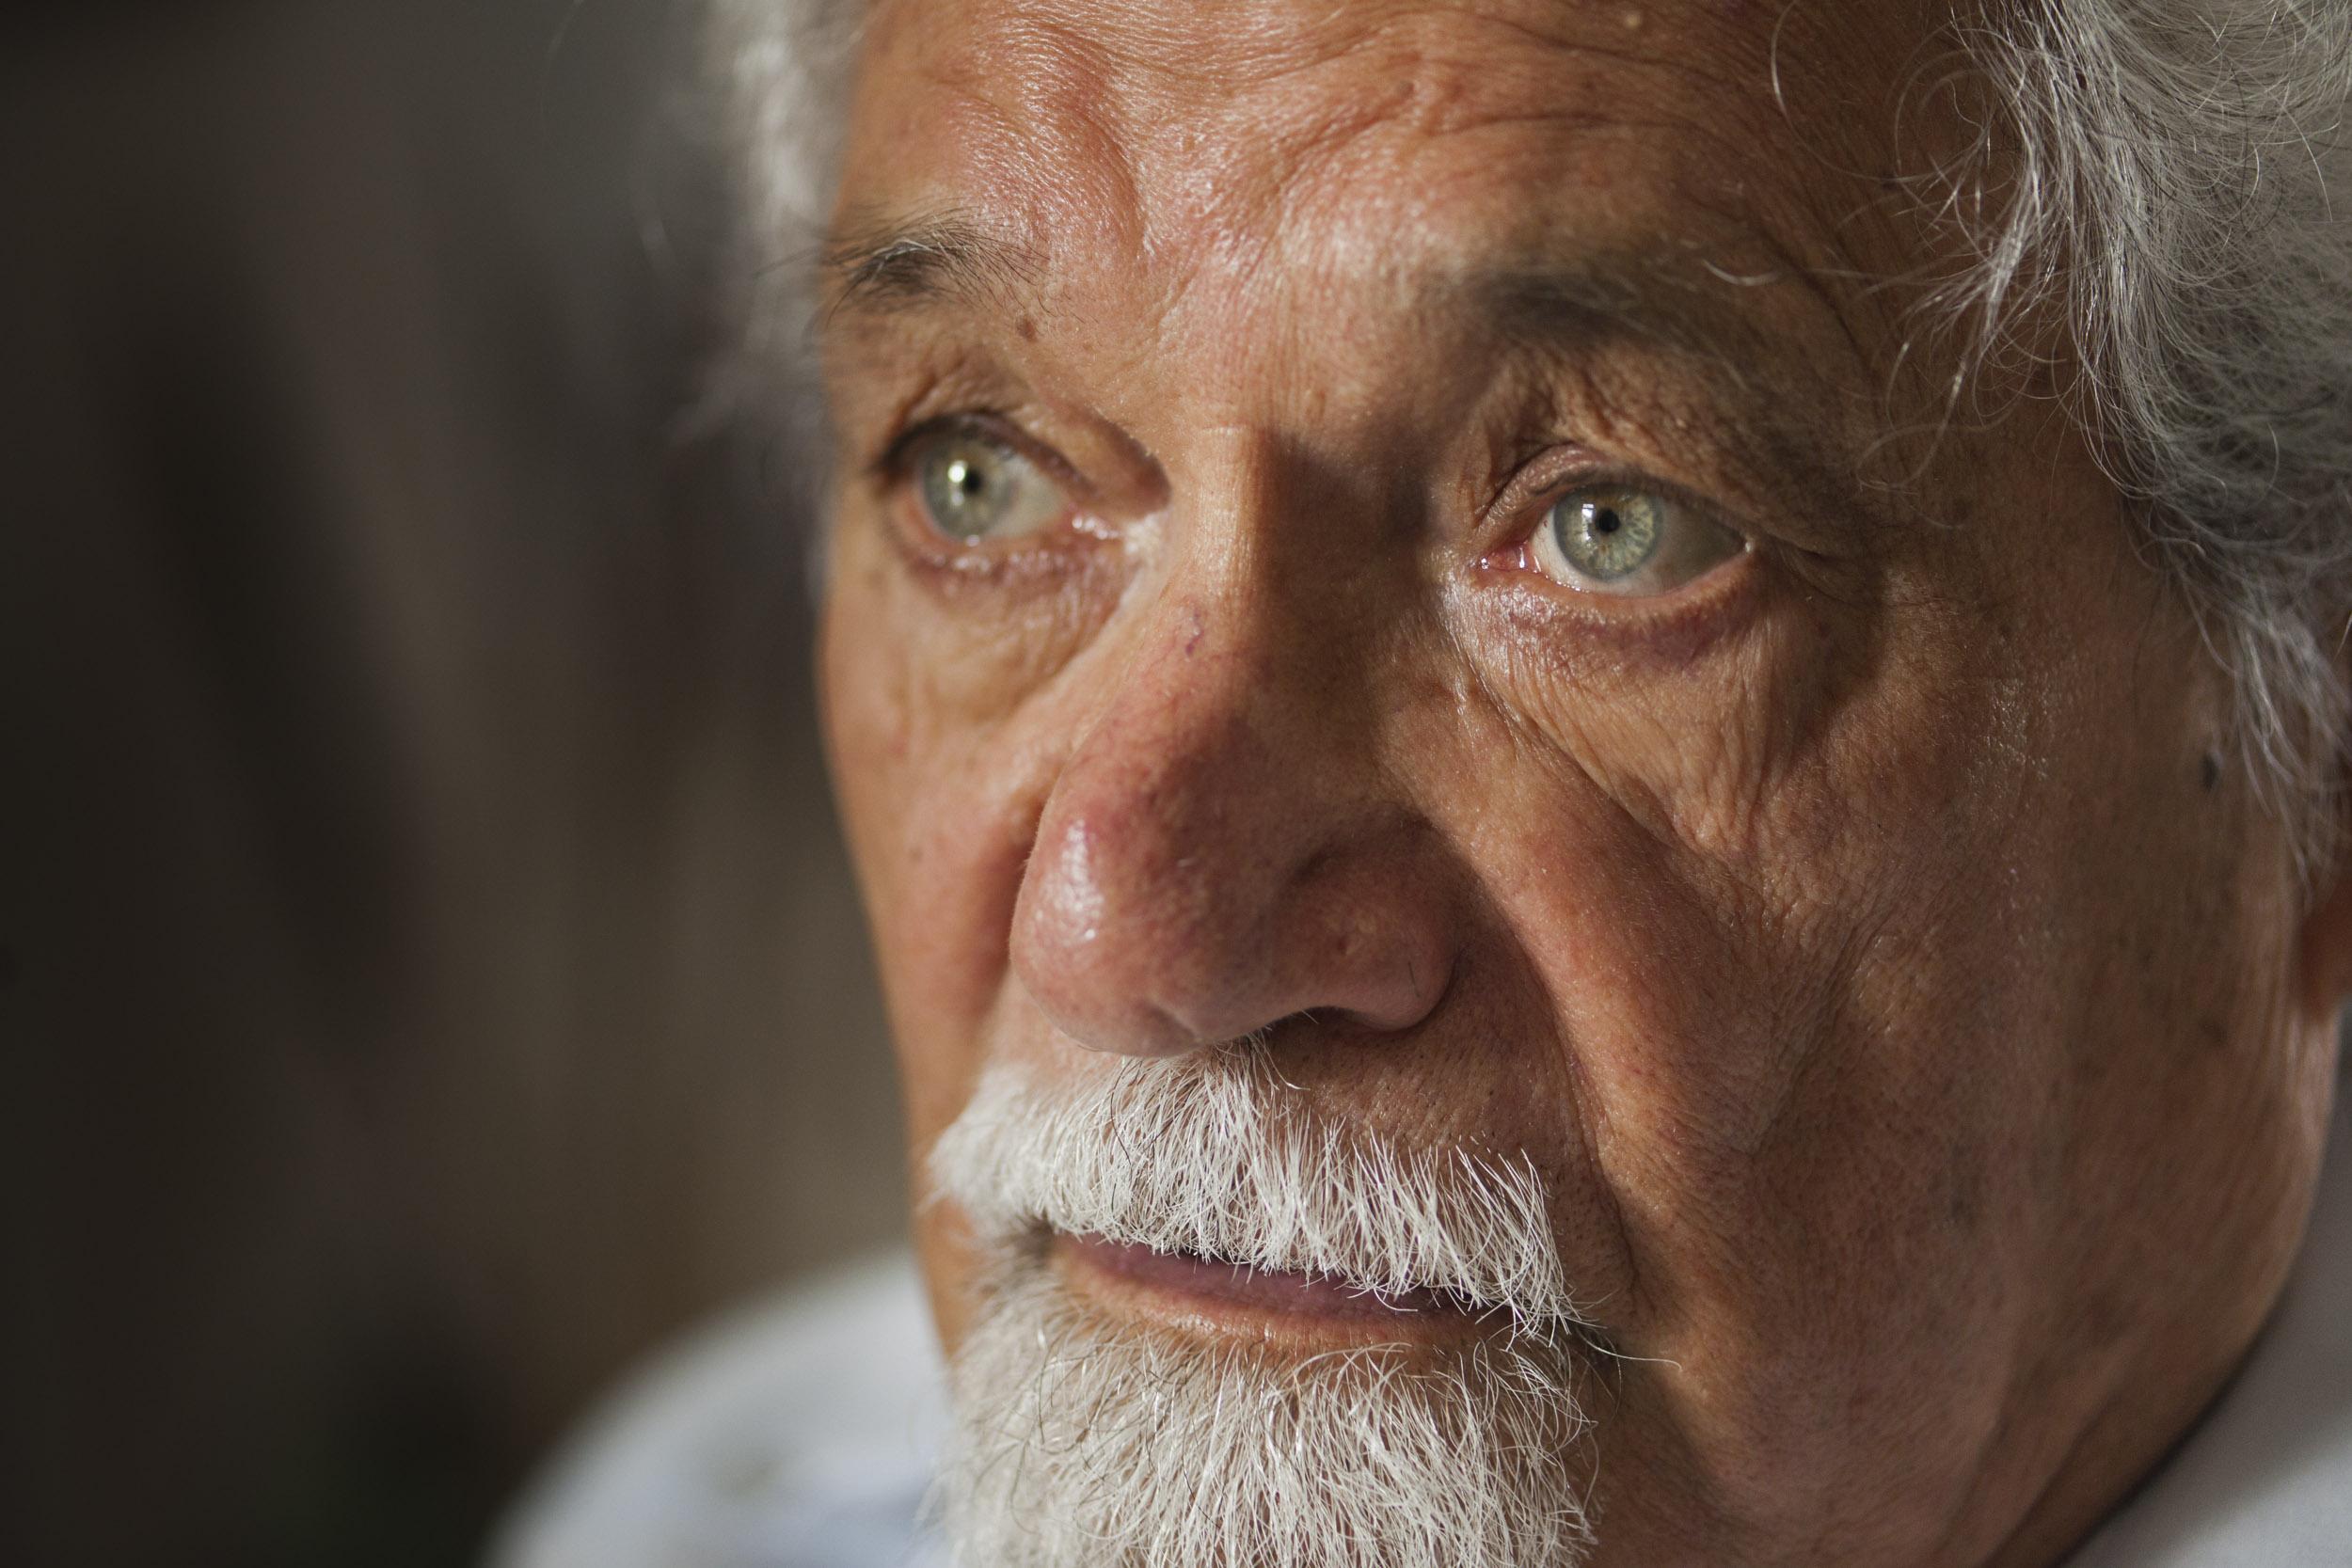 Pablo Armando Fernández, writer - Illuminated Cuba - Hector Garrido, Aerial and human photography